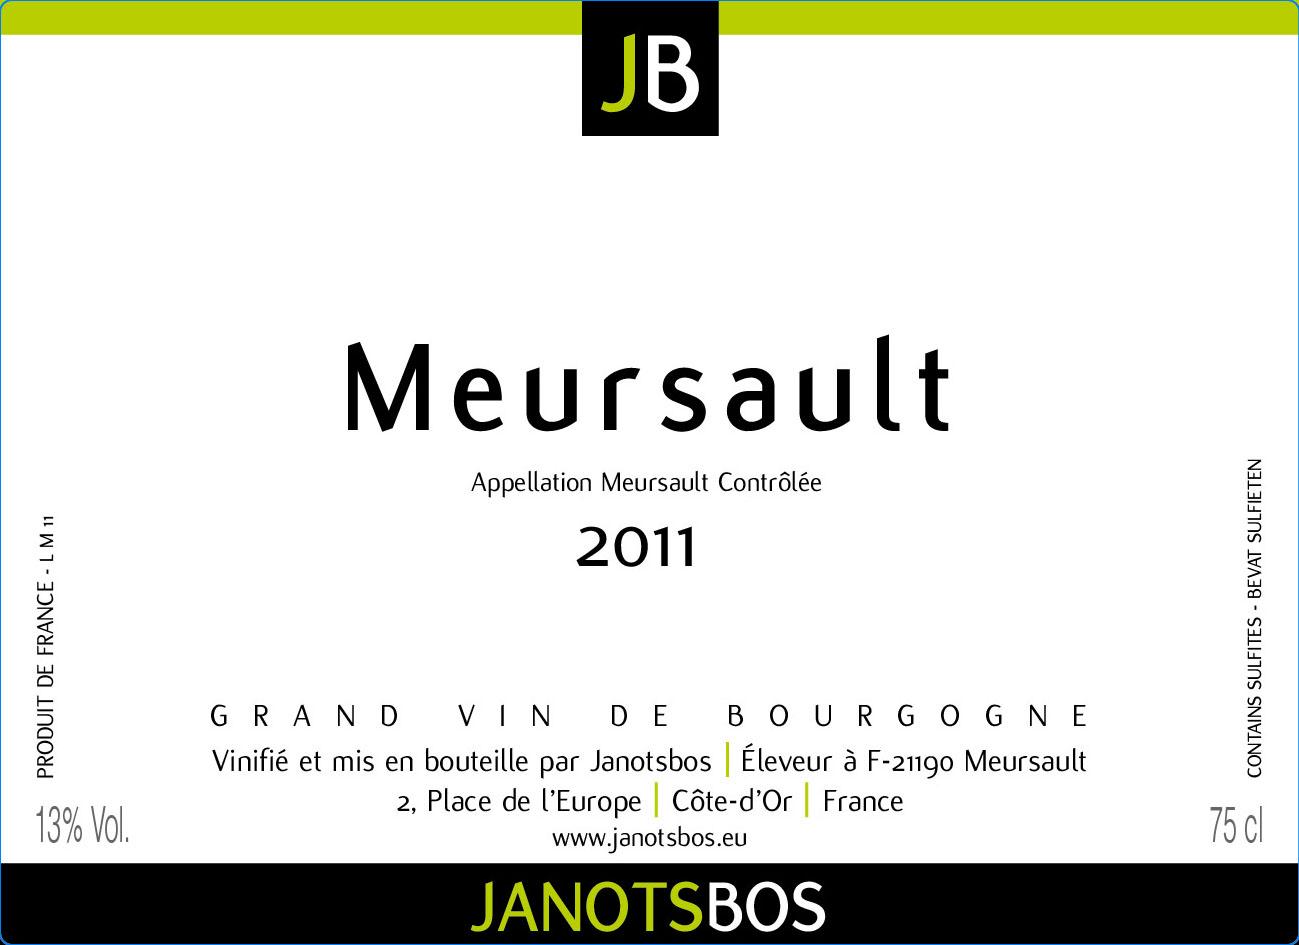 Meursault-2011.jpg